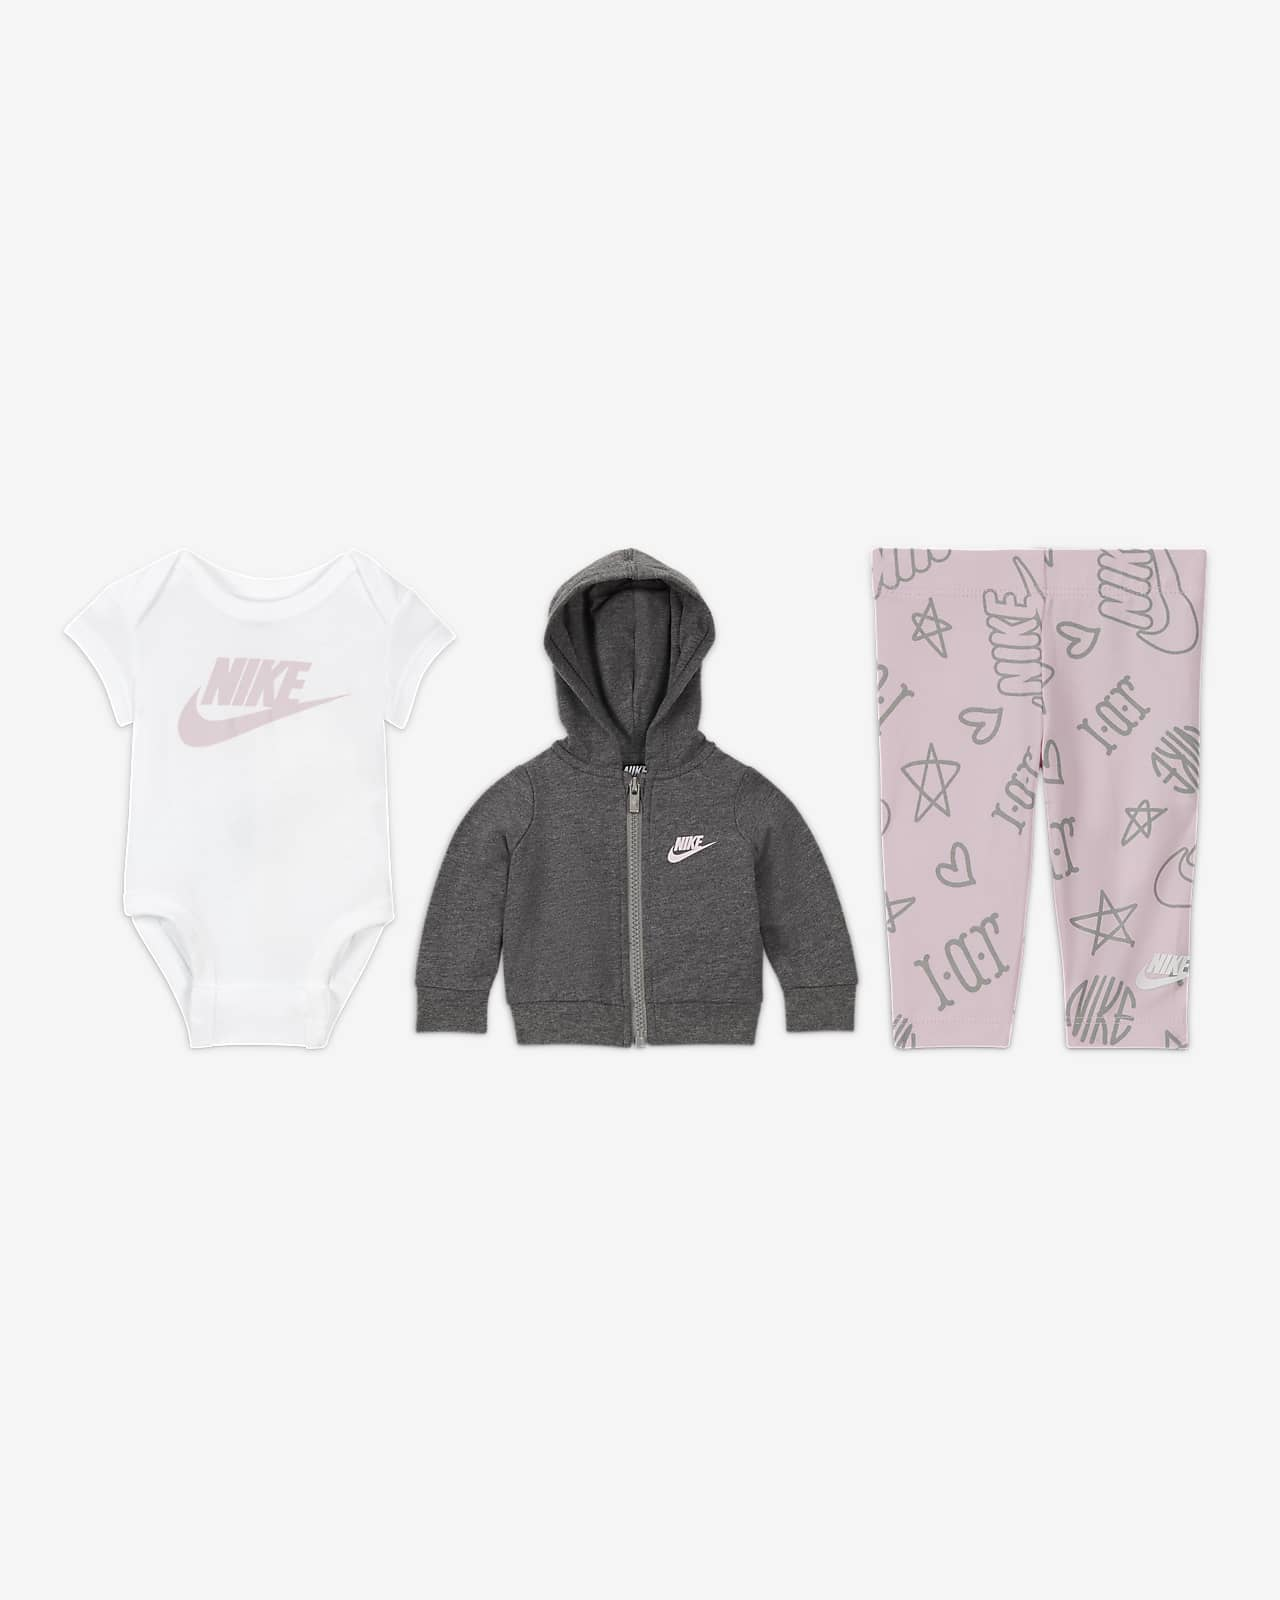 Nike Baby (0-9M) 3-Piece Set